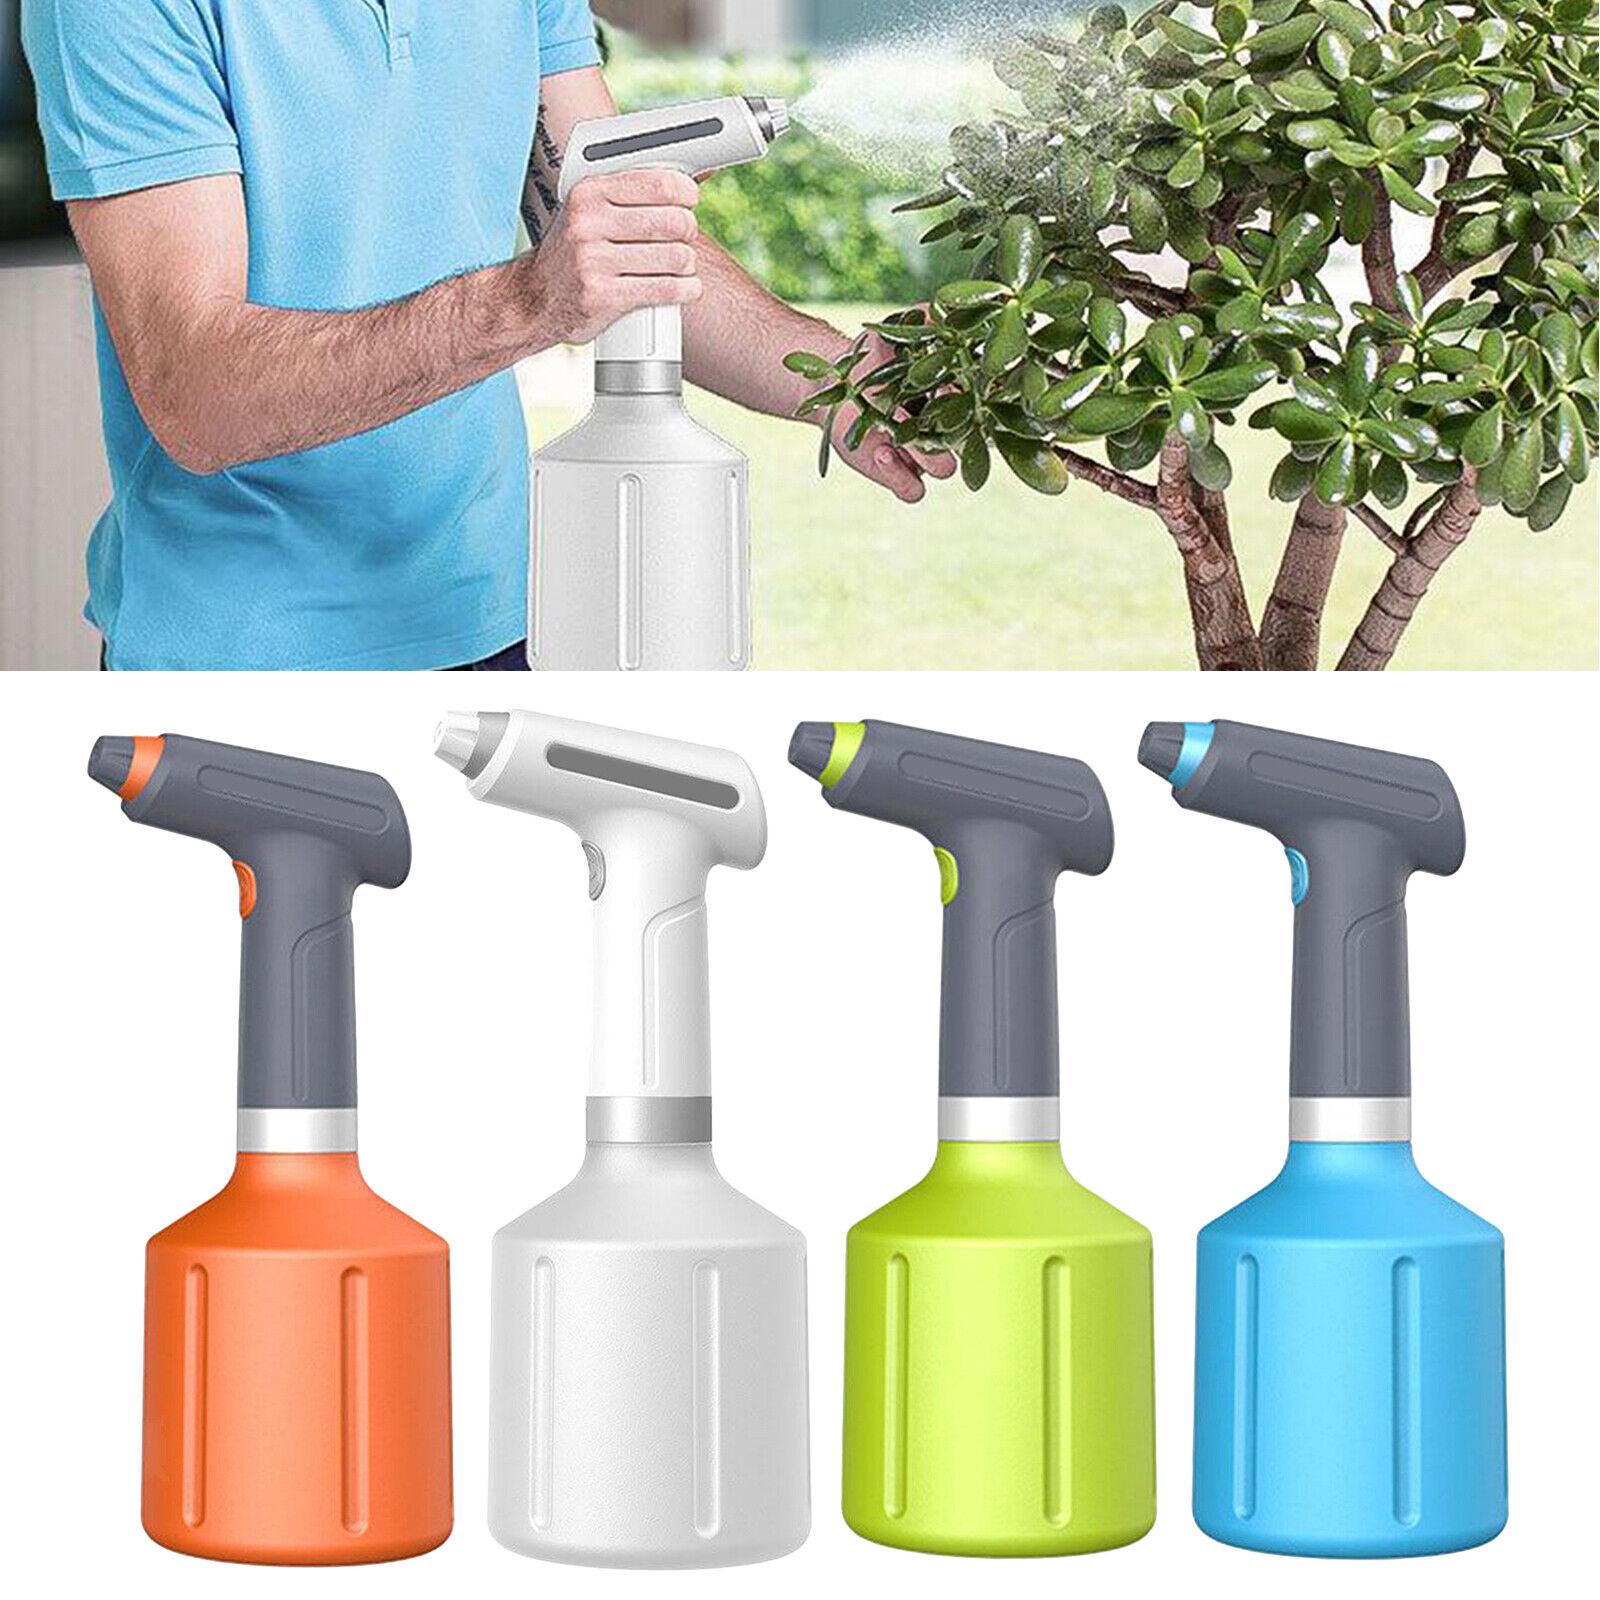 Handheld Electric Sprayer Atomizer Flower Plant Watering Fogger Indoor Outdoor